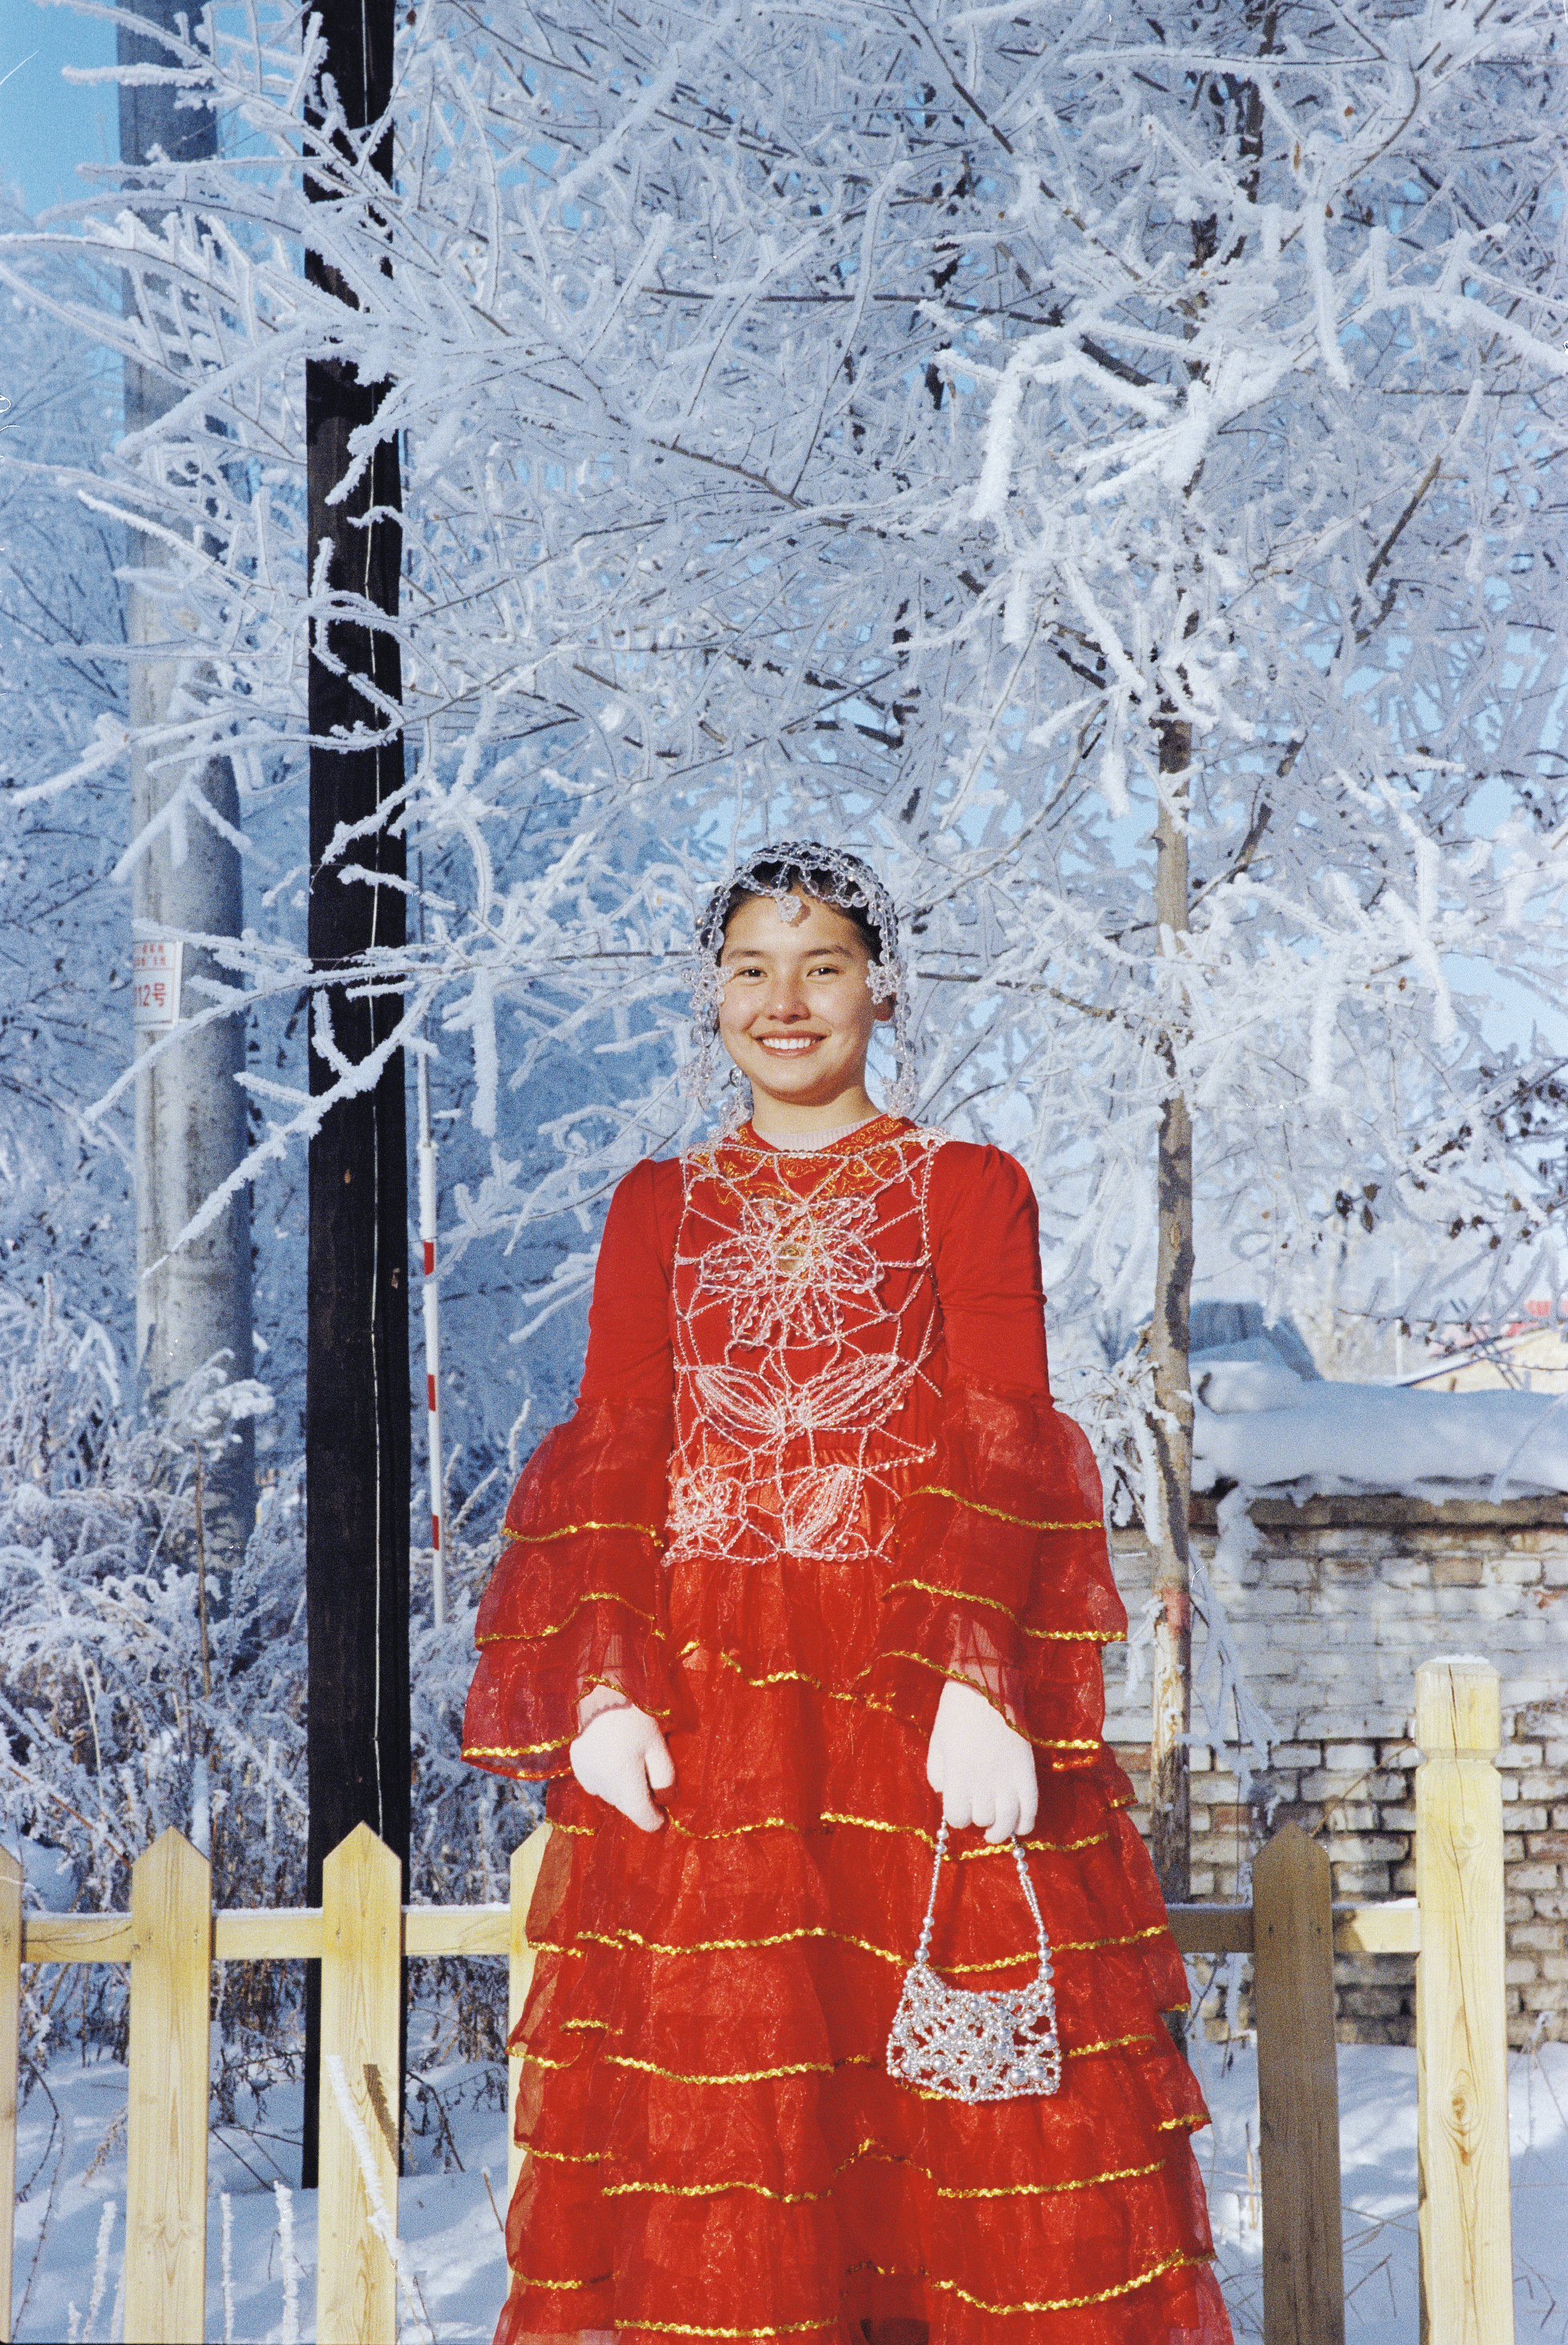 susan-fang-ss20-lookbook